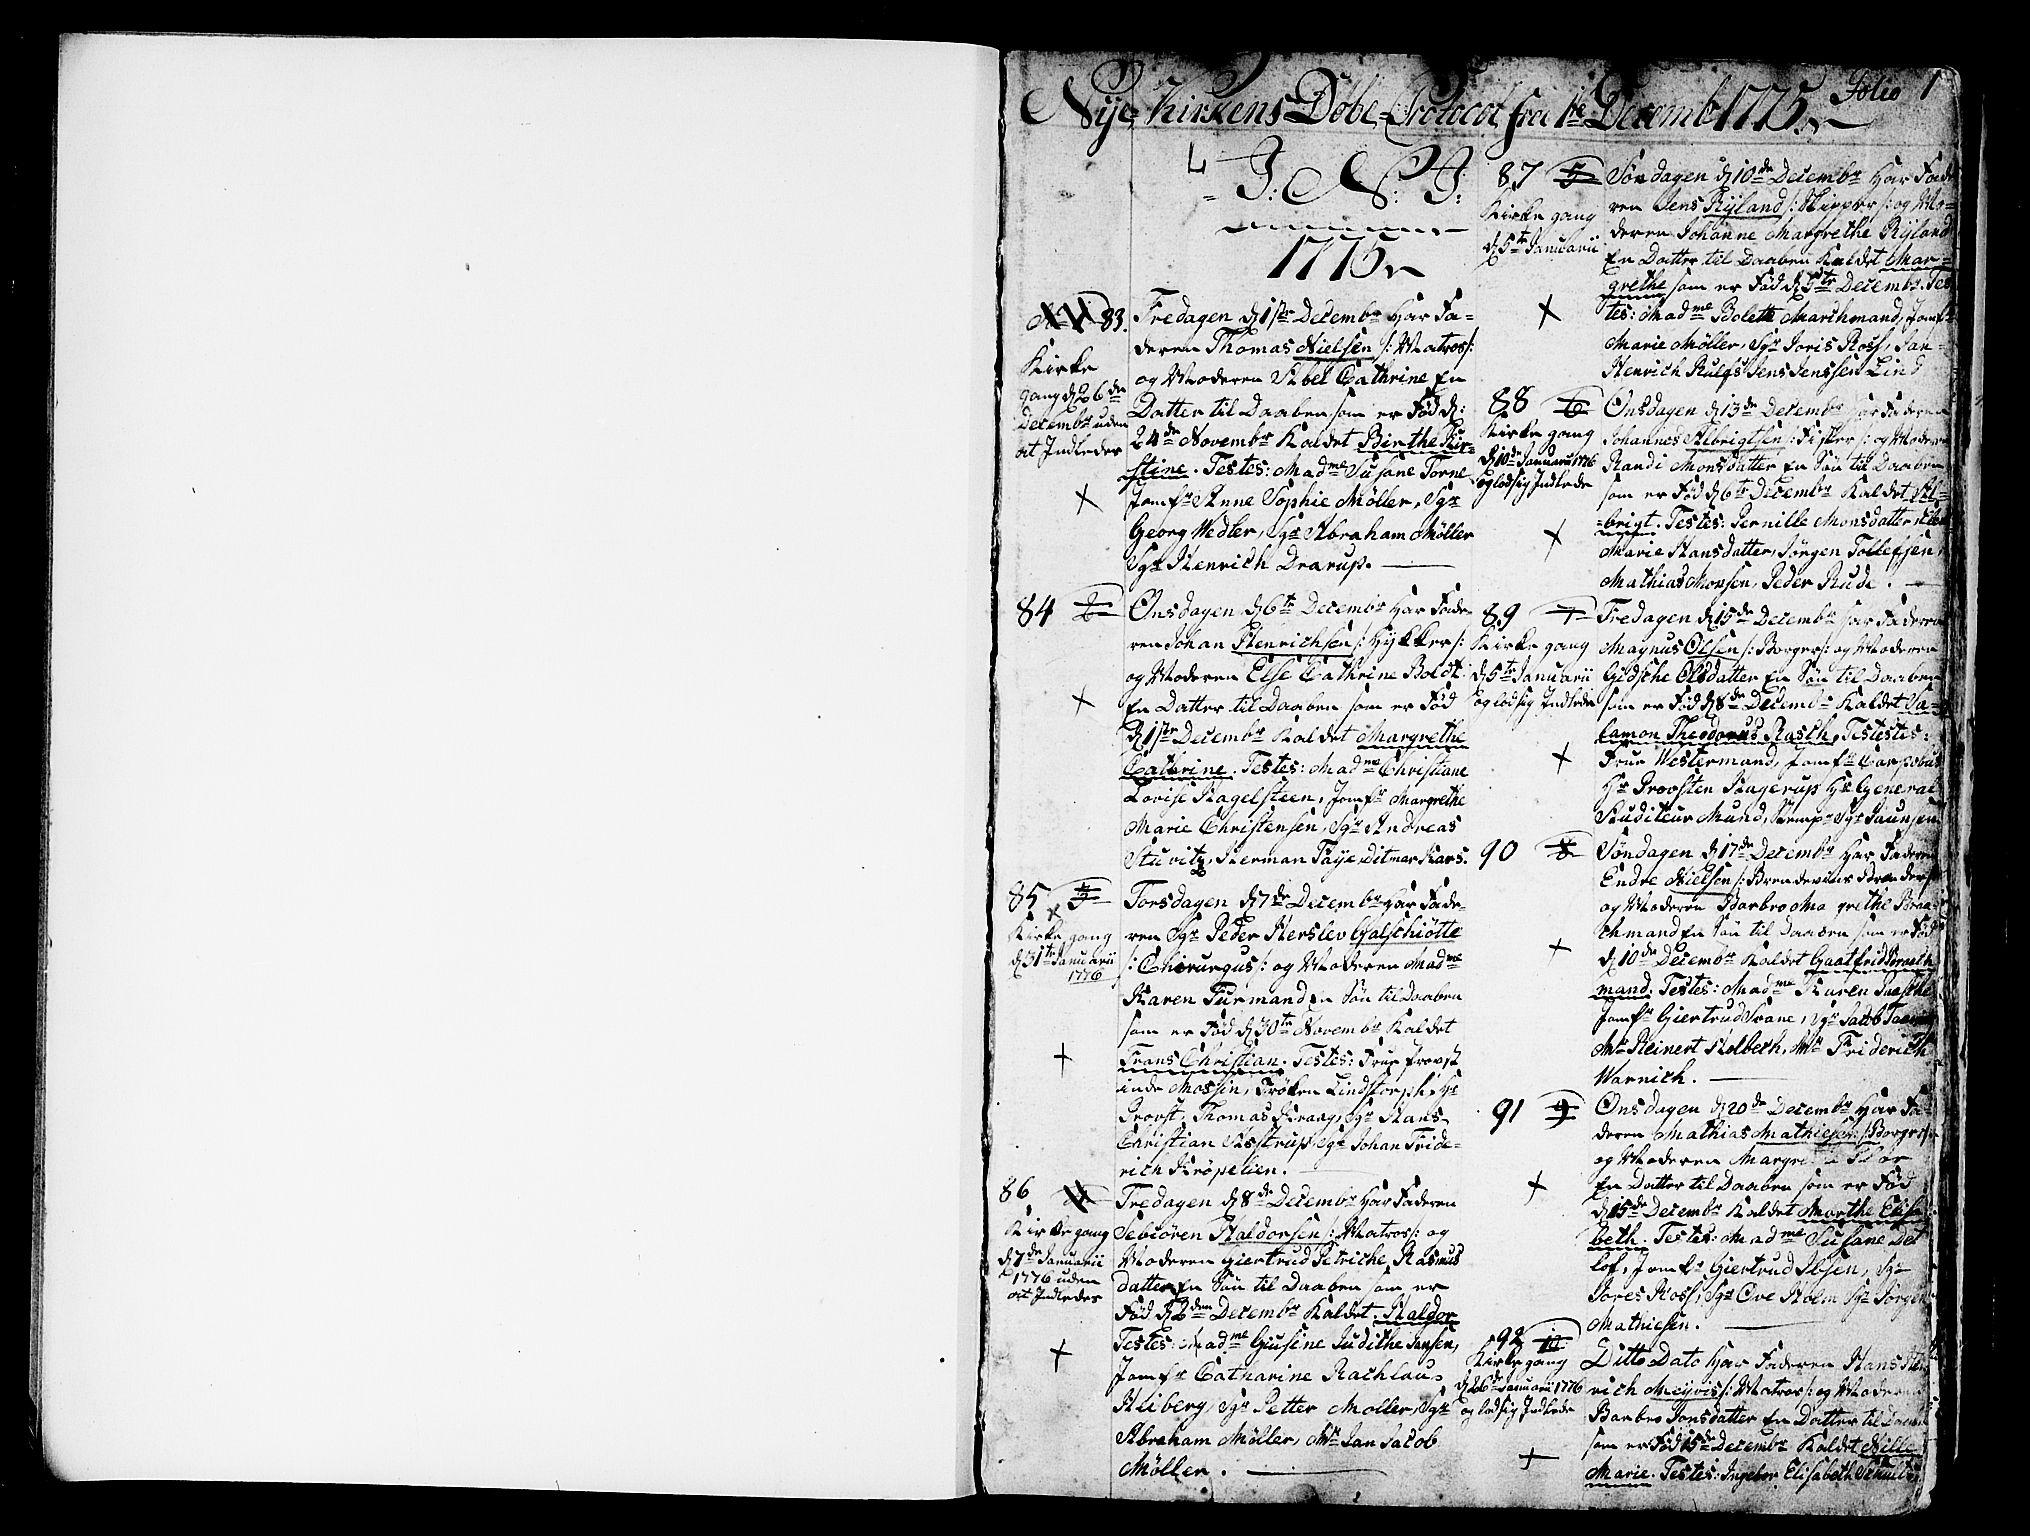 SAB, Nykirken Sokneprestembete, H/Haa: Ministerialbok nr. A 5, 1775-1808, s. 1